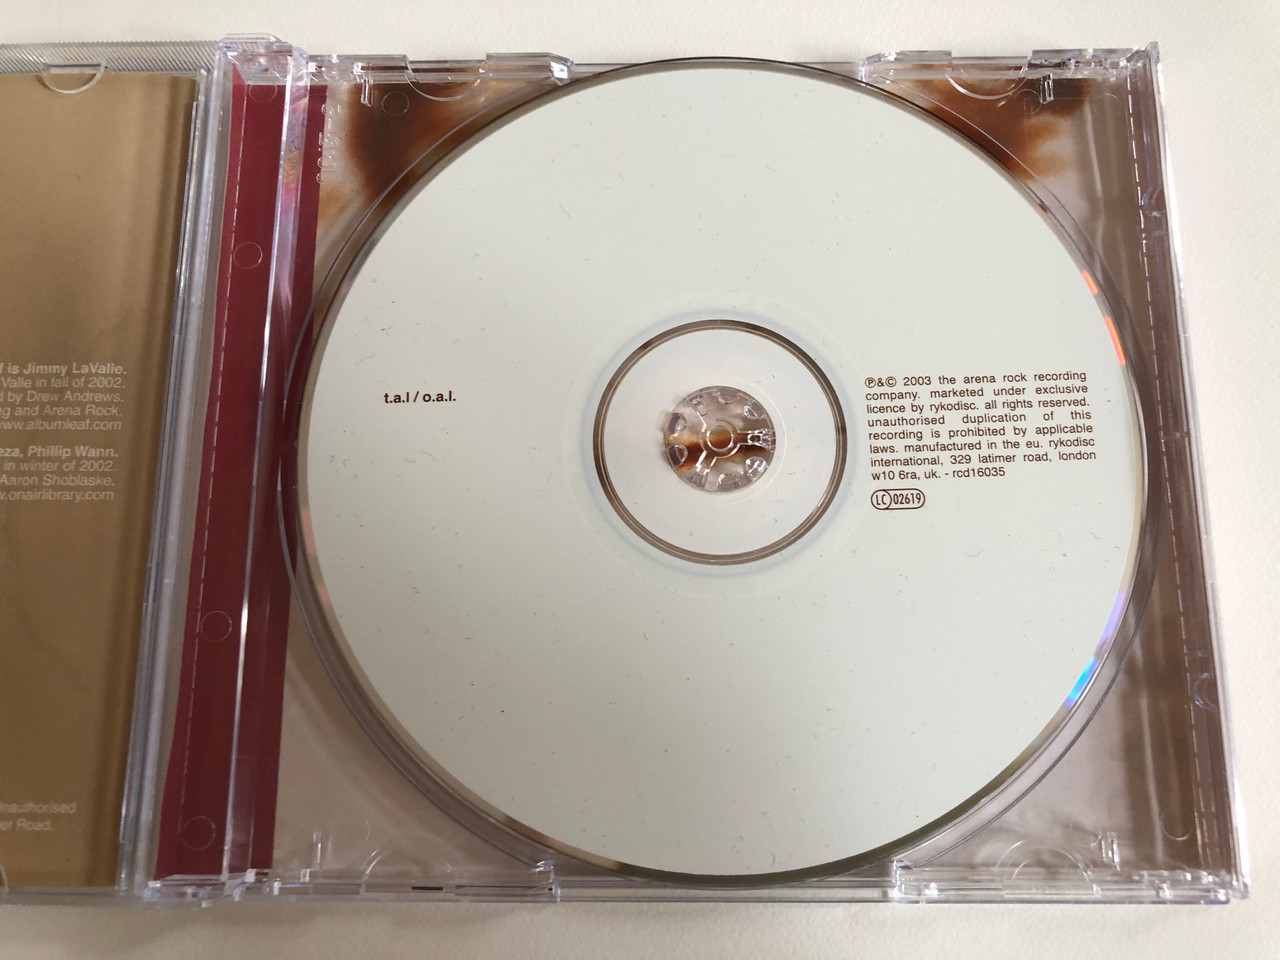 https://cdn10.bigcommerce.com/s-62bdpkt7pb/products/0/images/187513/A_Lifetime_Or_More_-_The_Album_Leaf_OnAirLibrary_Rykodisc_Audio_CD_2003_RCD16035_3__05715.1628853712.1280.1280.JPG?c=2&_gl=1*4q7vvm*_ga*MjA2NTIxMjE2MC4xNTkwNTEyNTMy*_ga_WS2VZYPC6G*MTYyODg0NTUyMi4zMi4xLjE2Mjg4NTM4NjUuNjA.